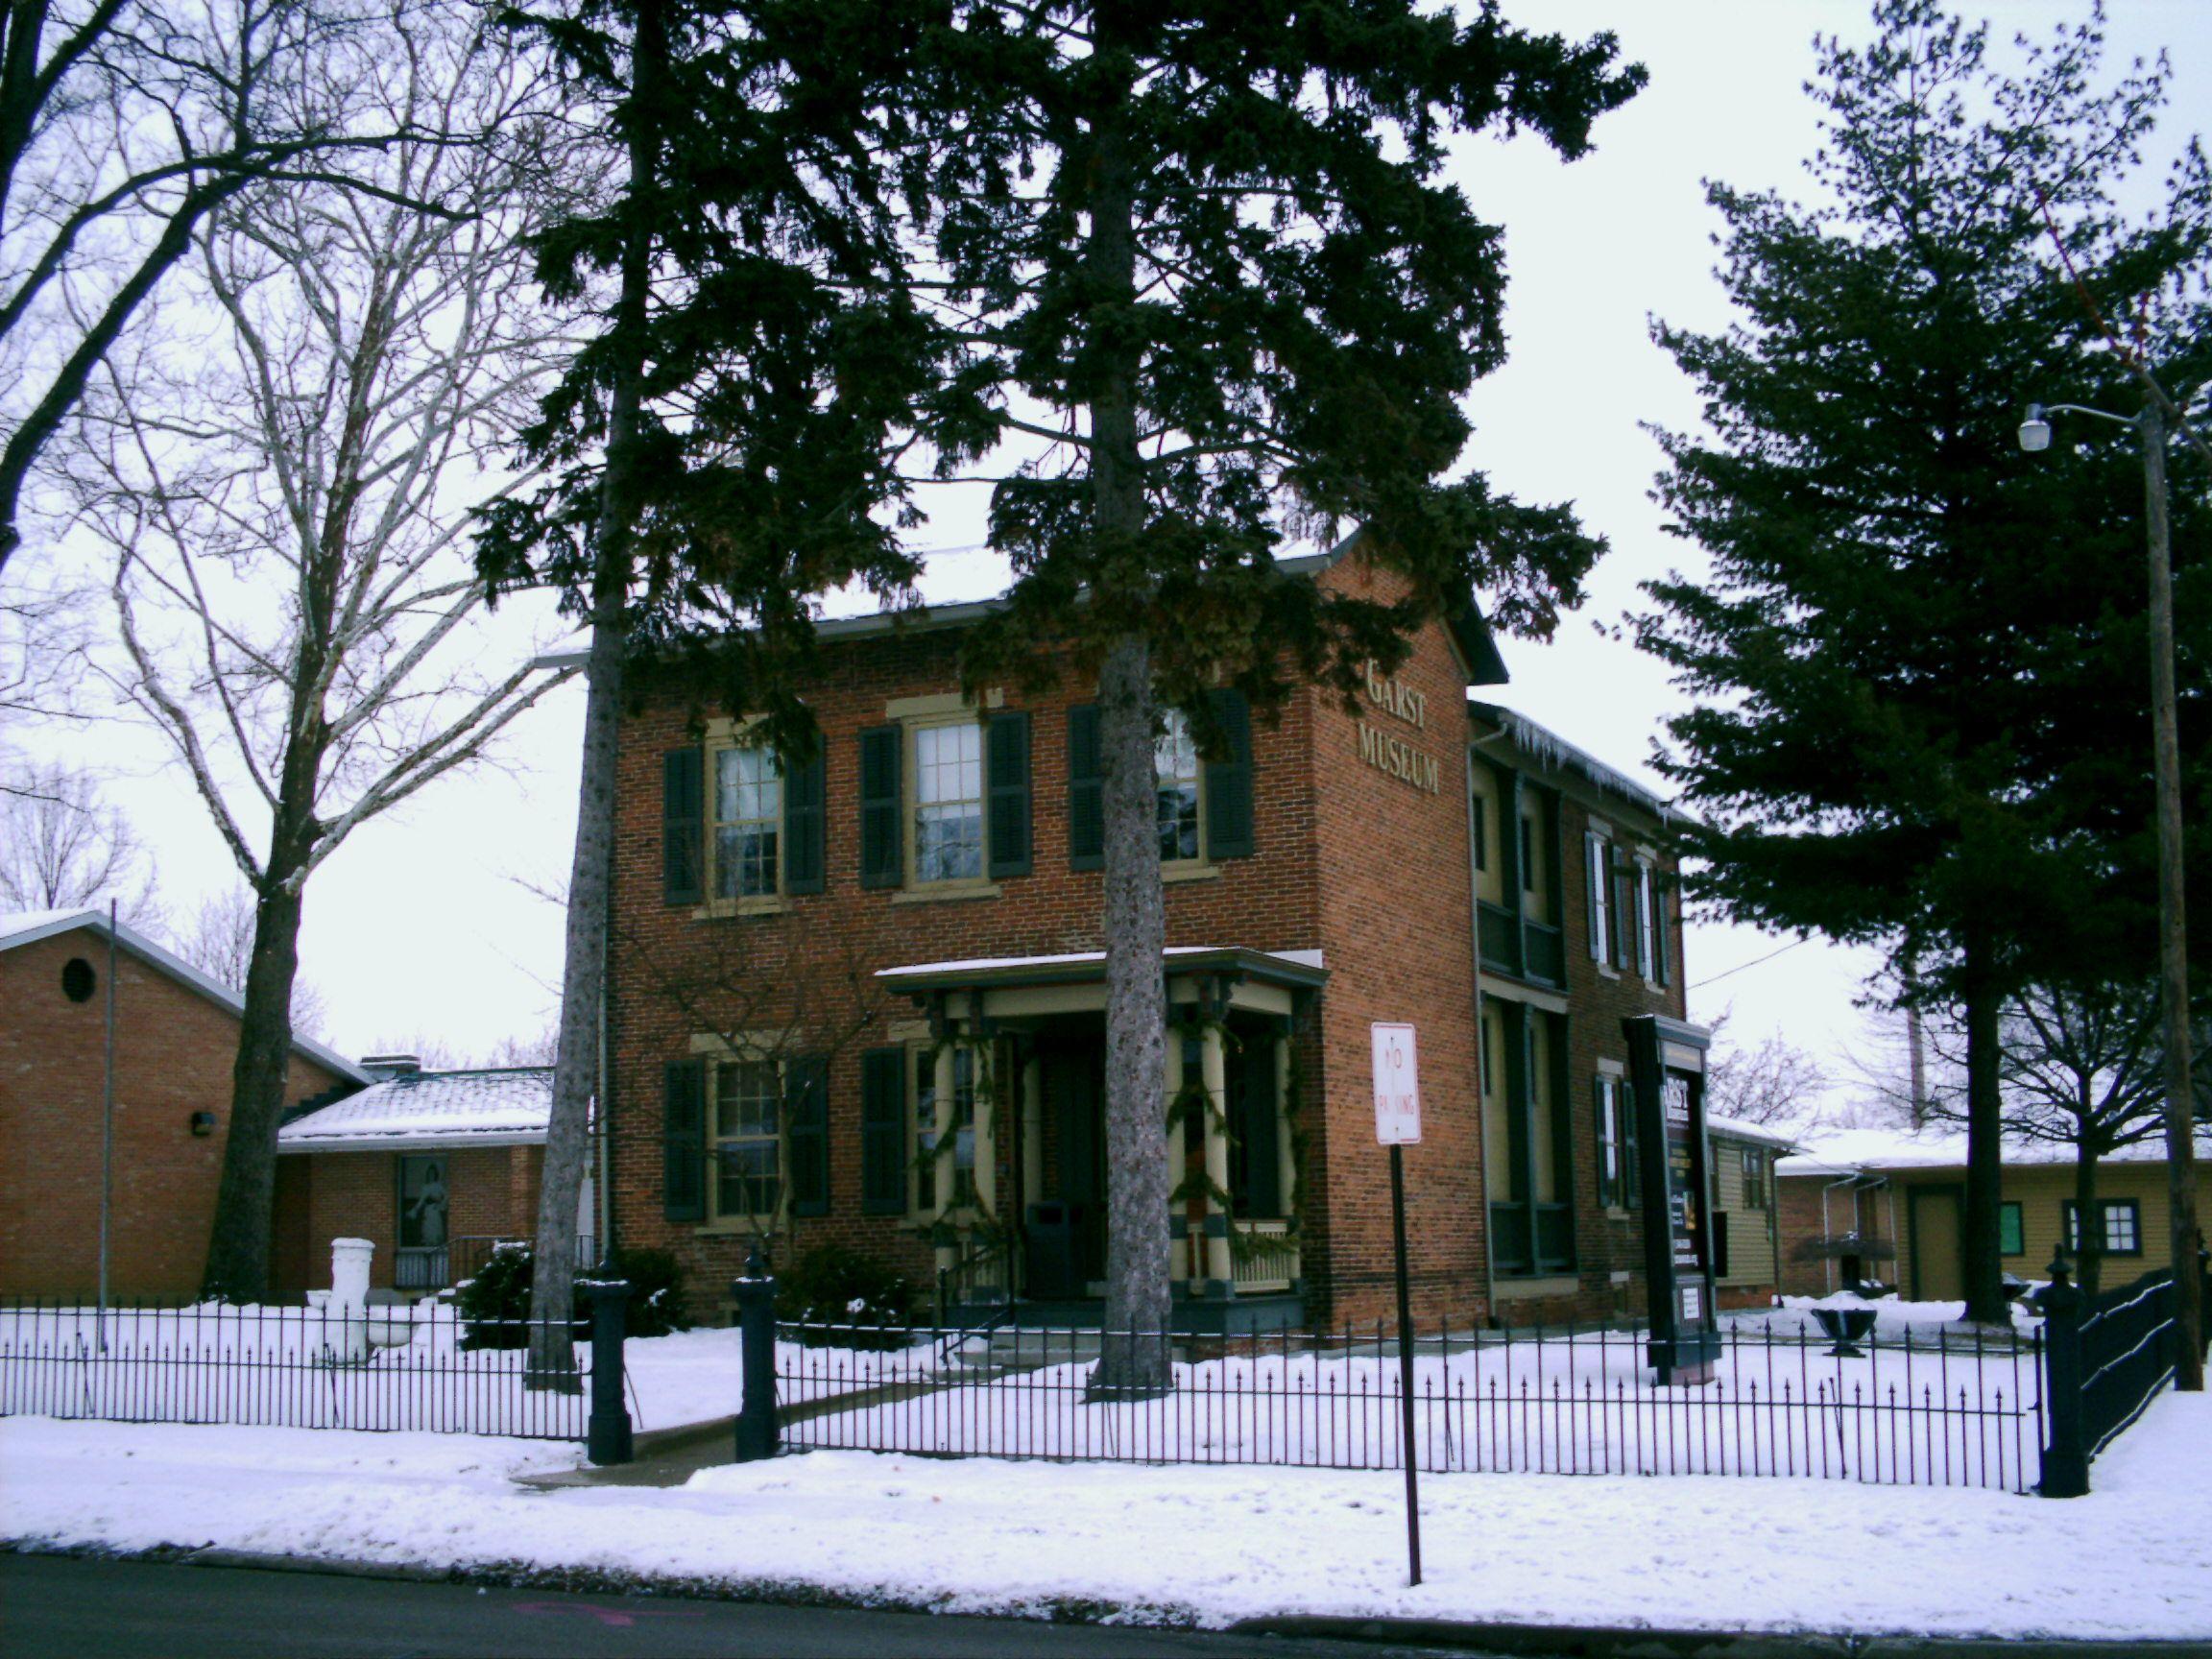 Ohio darke county north star - Greenville Oh Darke County The Garst Museum On N Broadway St